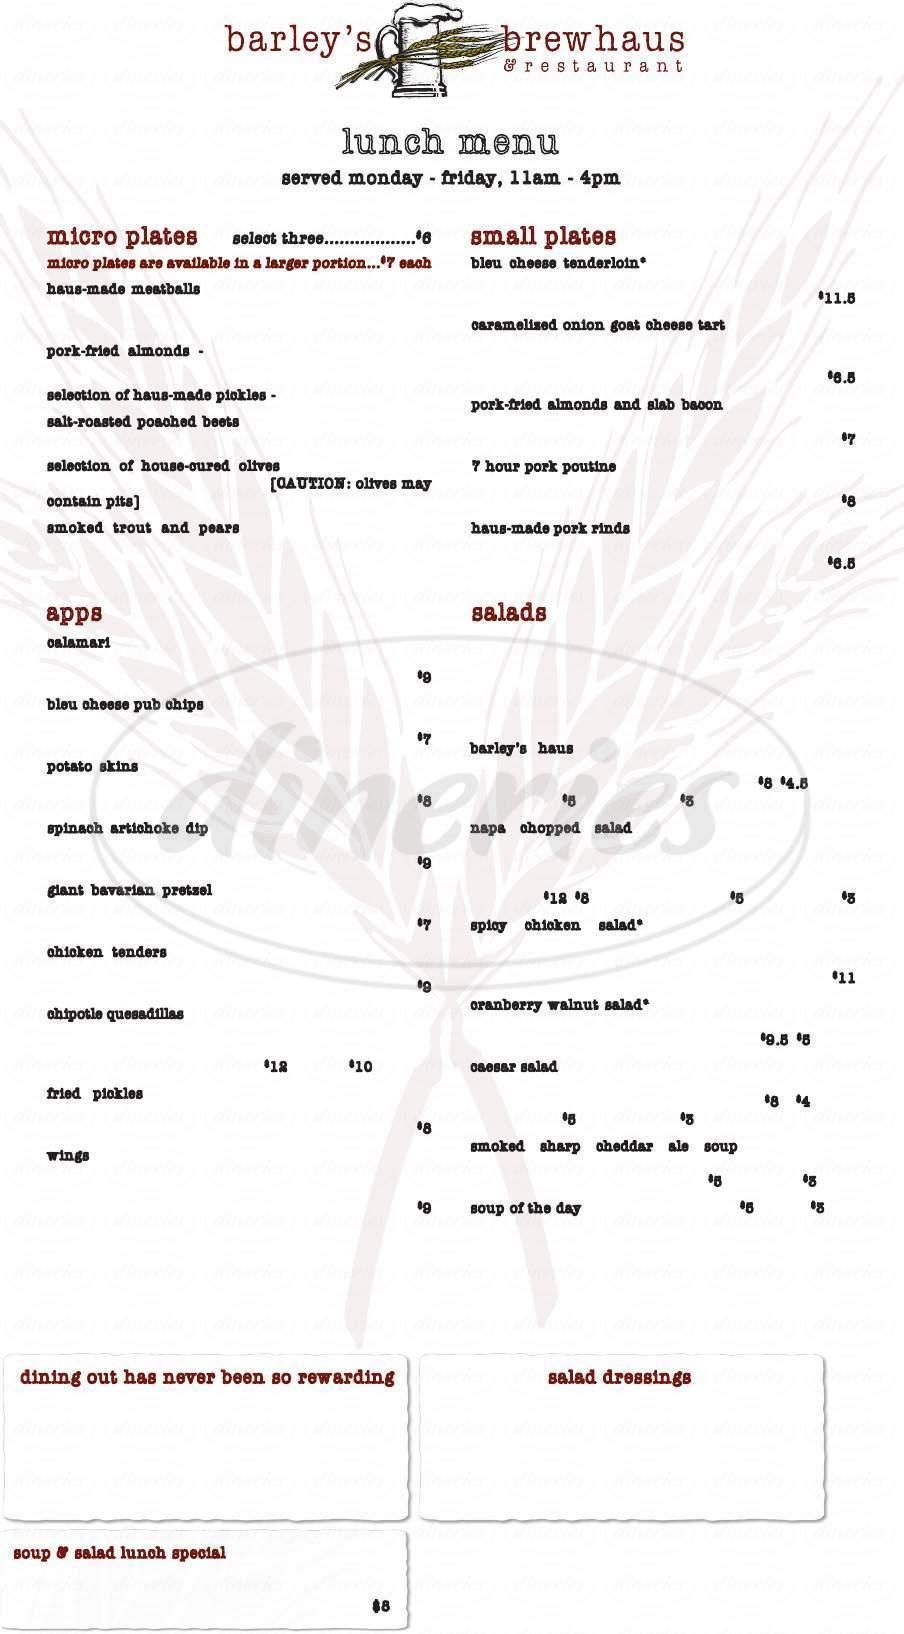 menu for Barley's Brewhaus